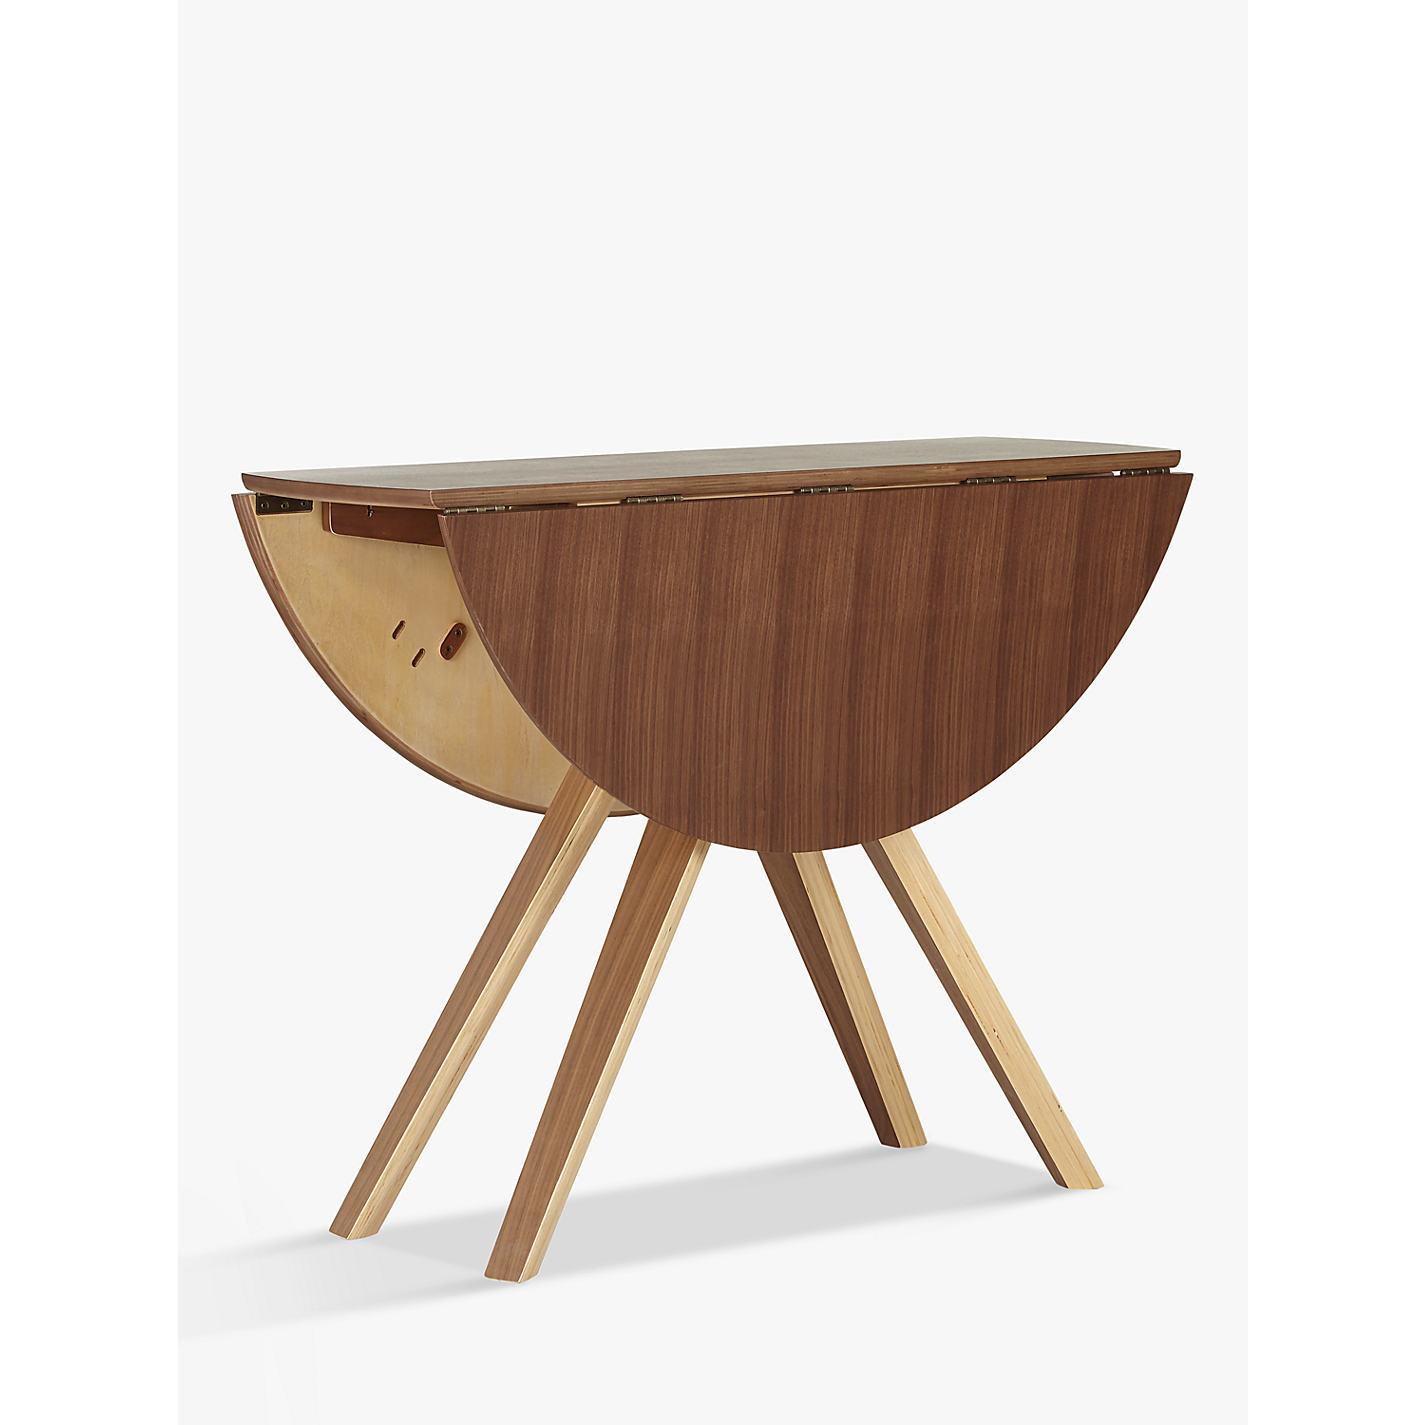 Drop Leaf Dining Table Buy John Lewis Radar 4 Seater Drop Leaf Dining Table Walnut